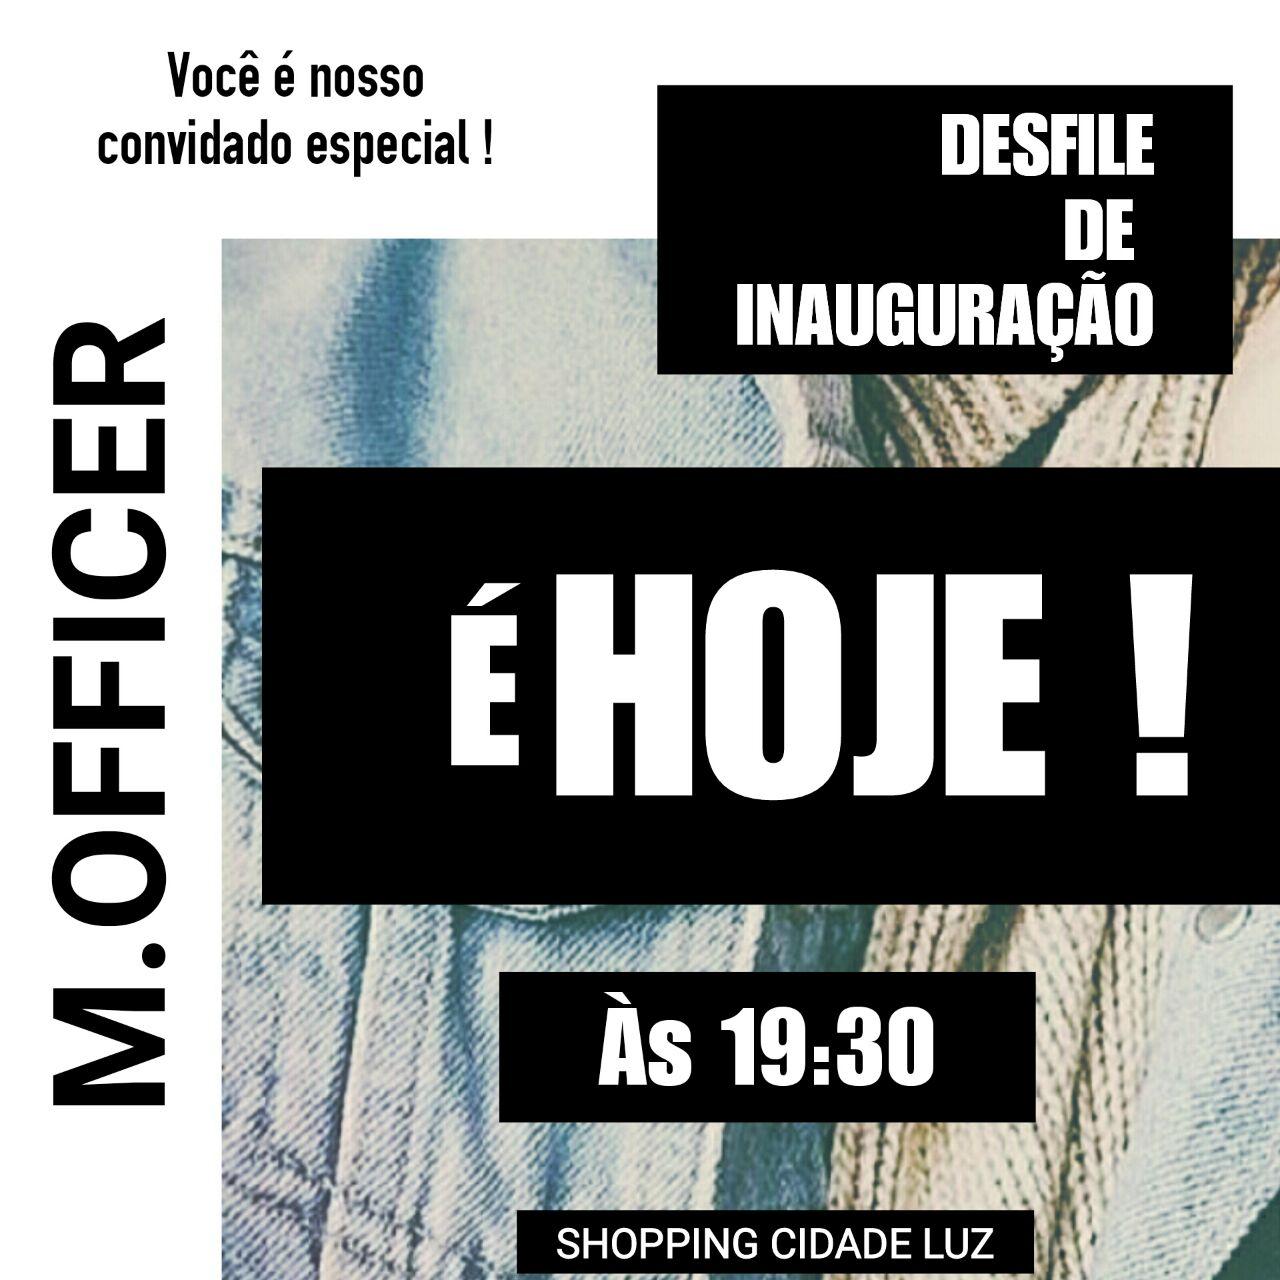 M_OFFICER_ehHOJE_dias